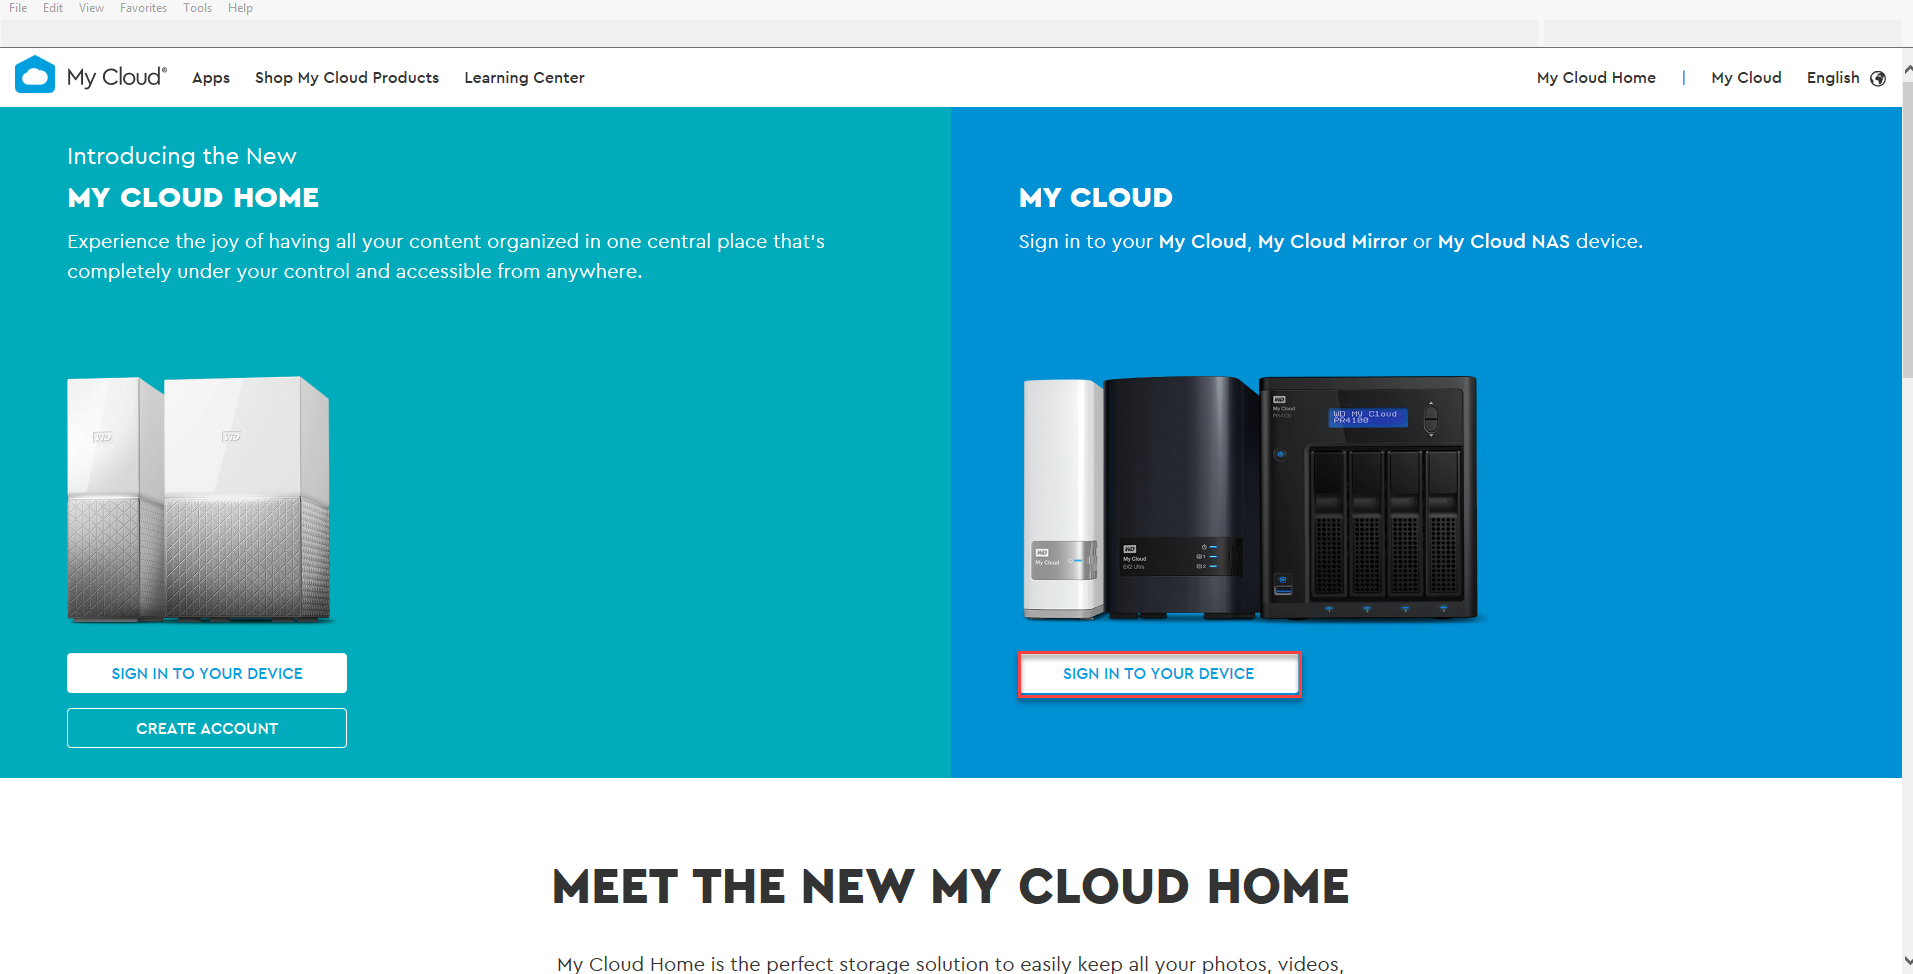 How to access a My Cloud device through MyCloud com